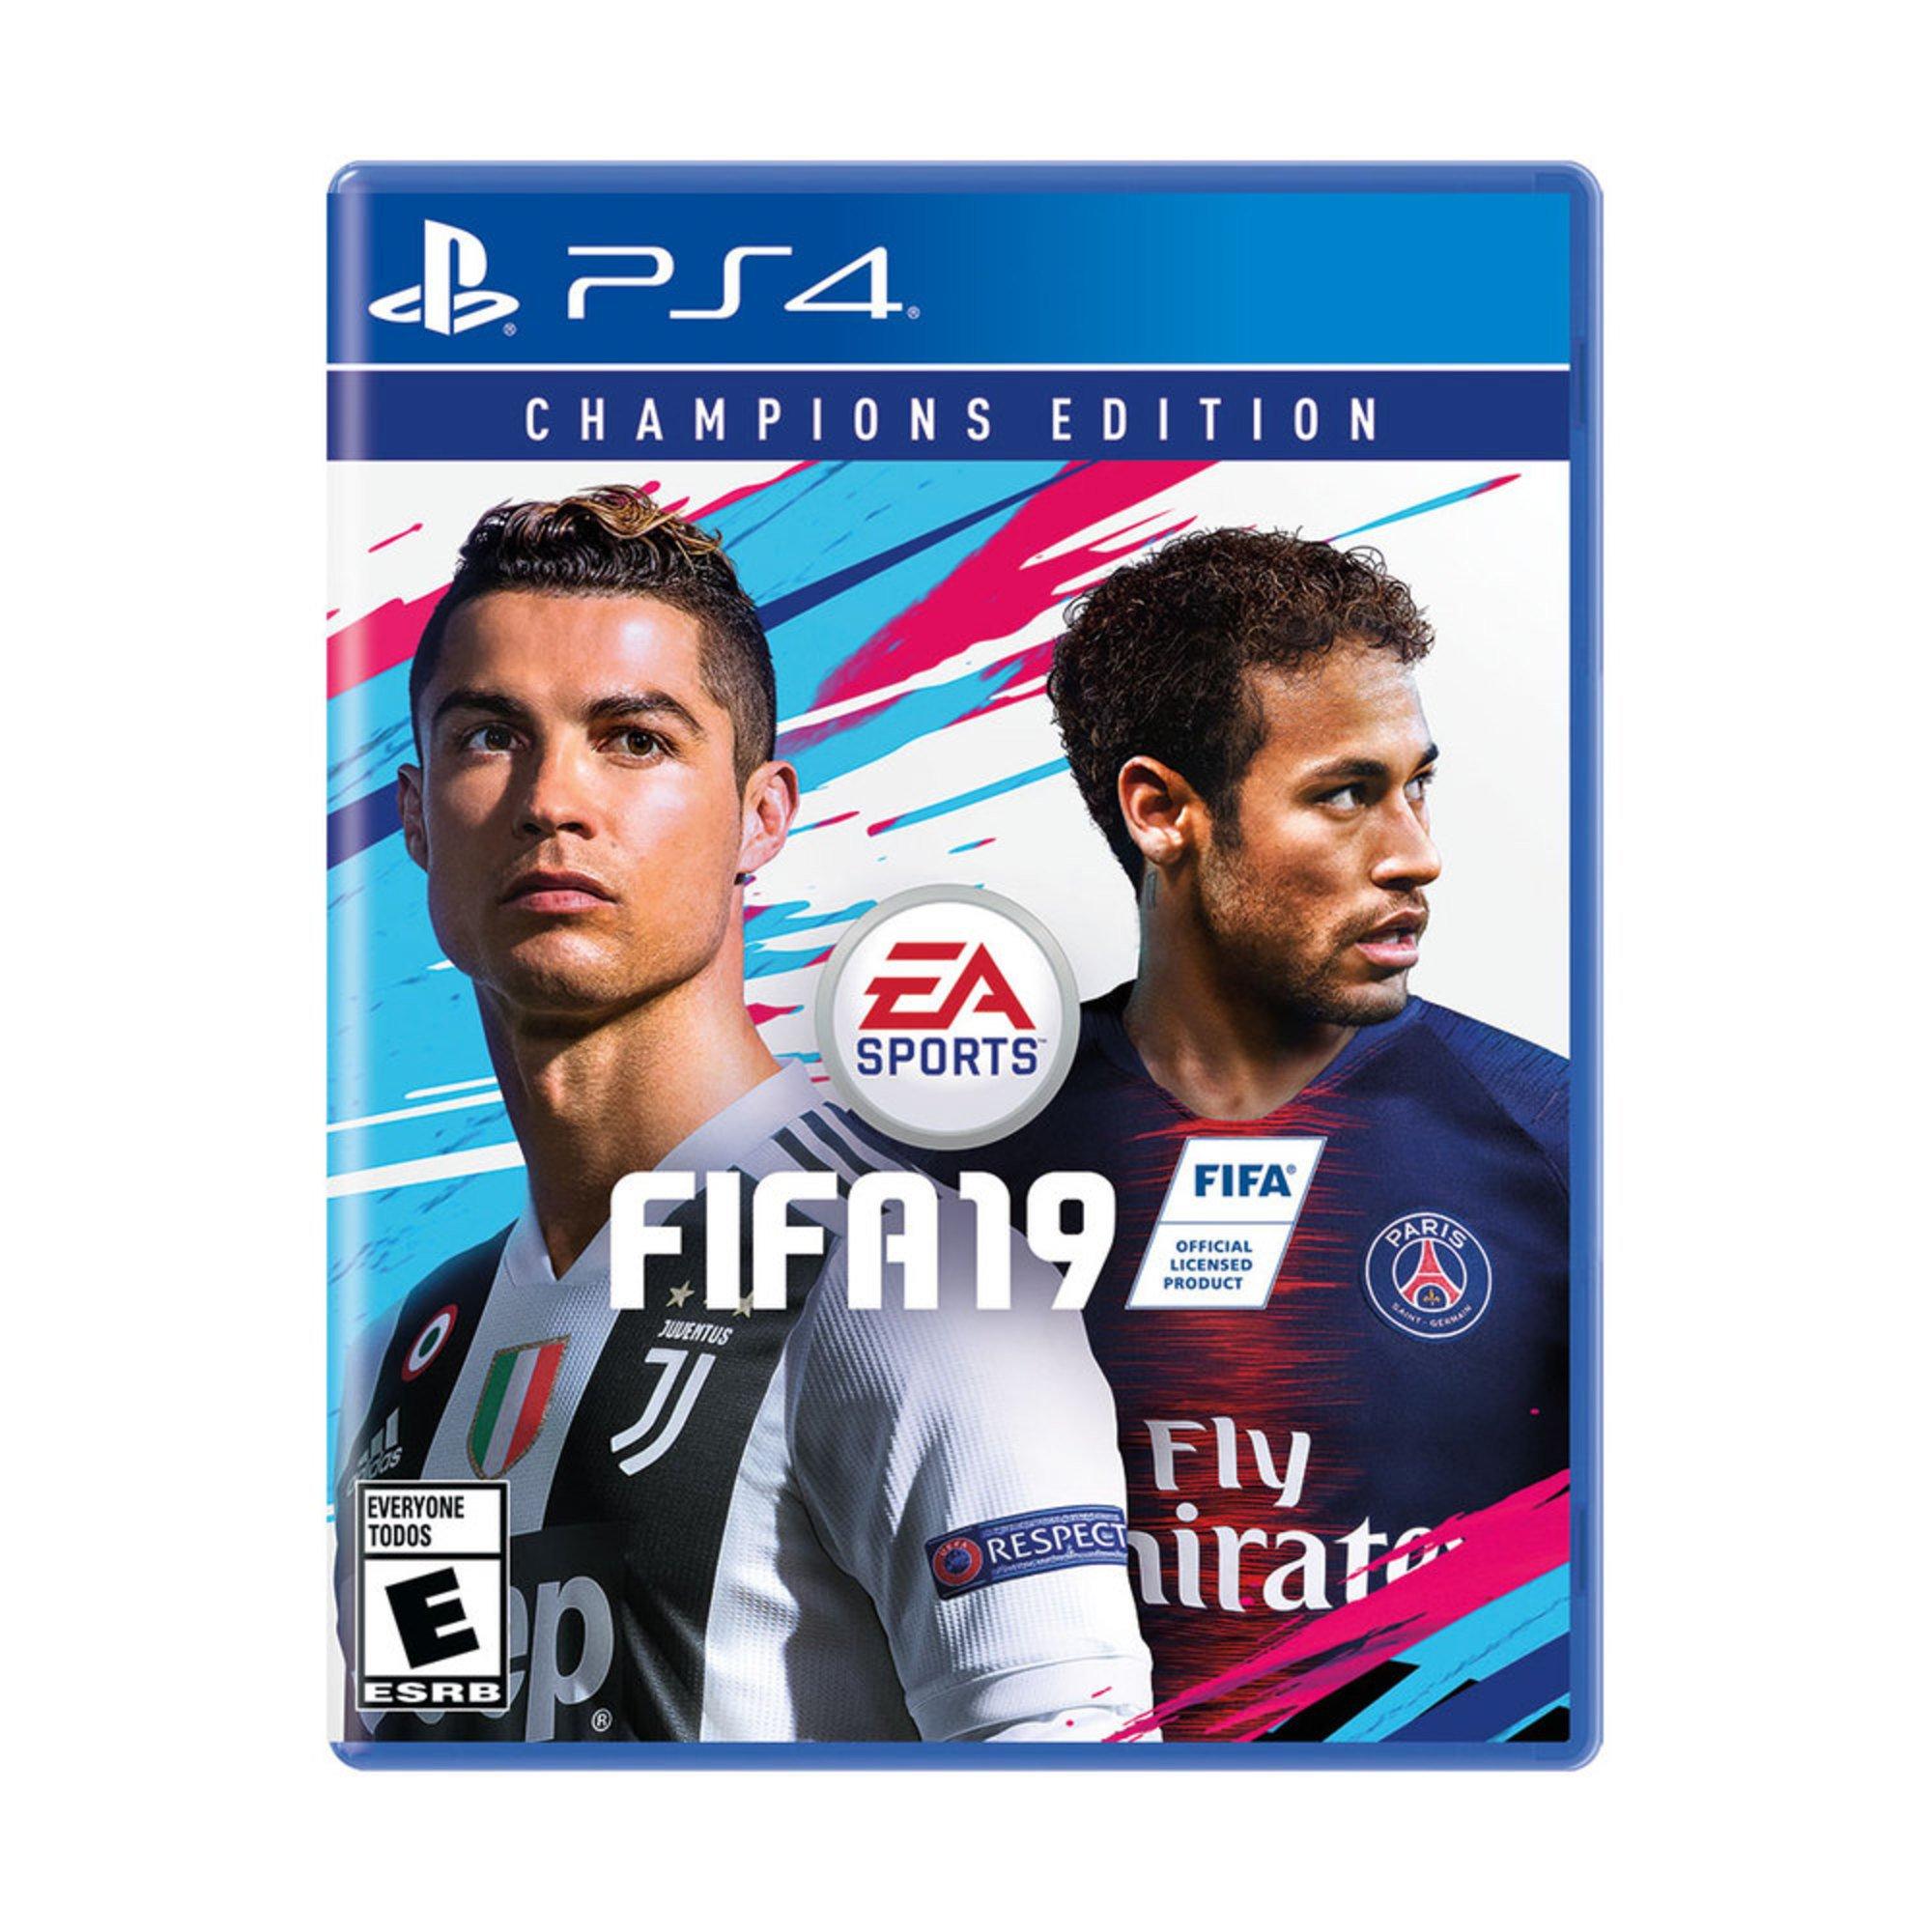 Ps4 Fifa 19 Champions Edition | Playstation 4 Games